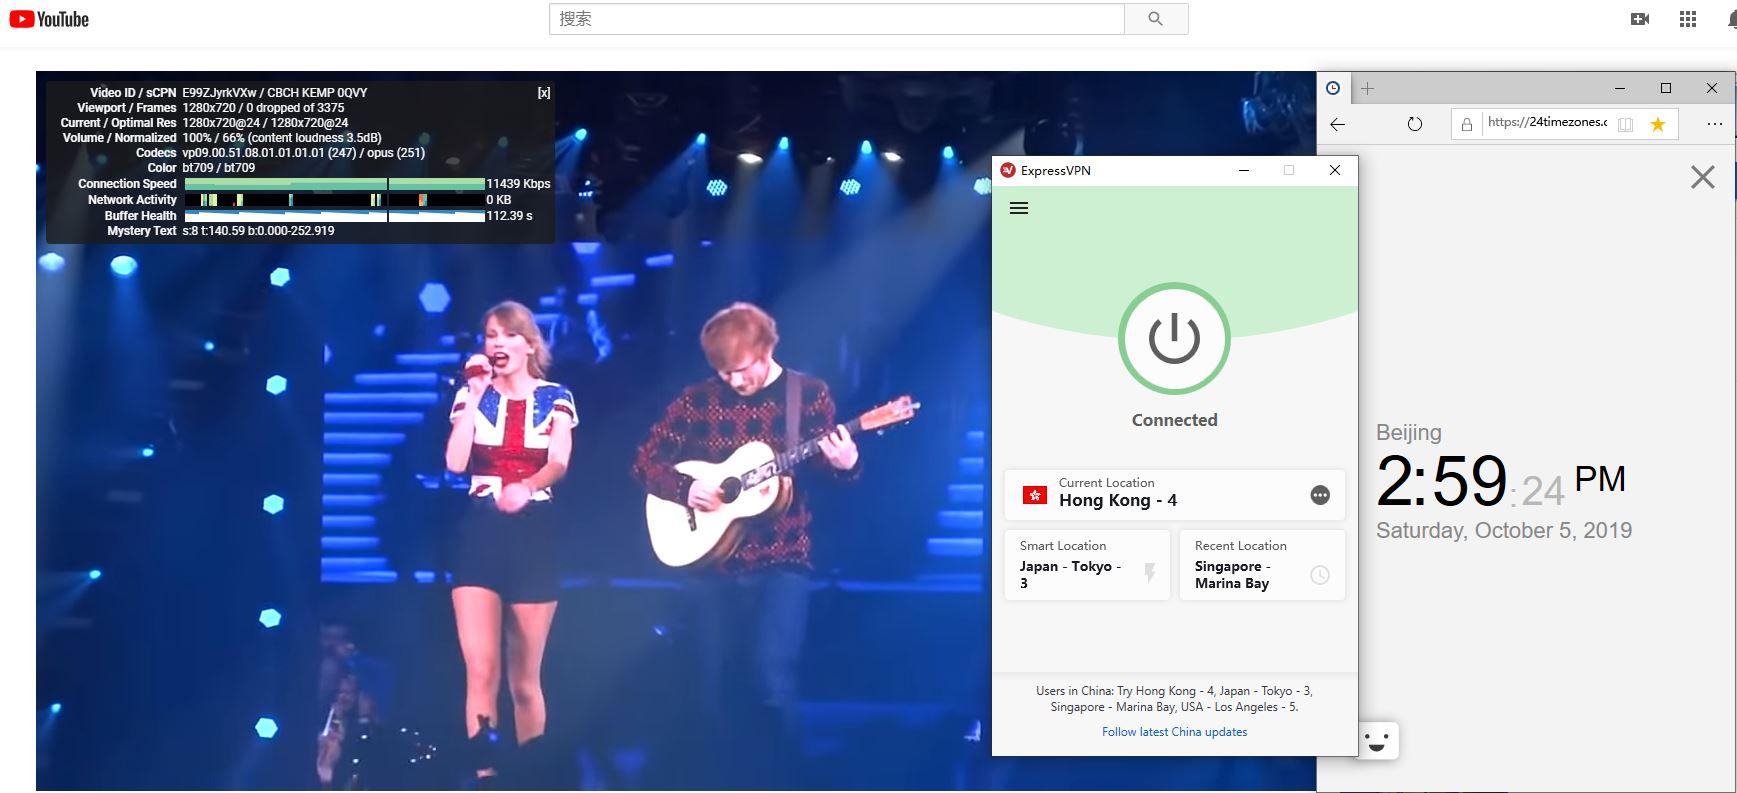 Windows ExpressVPN Hong Kong - 4 中国VPN翻墙 科学上网 YouTube测试-20191005